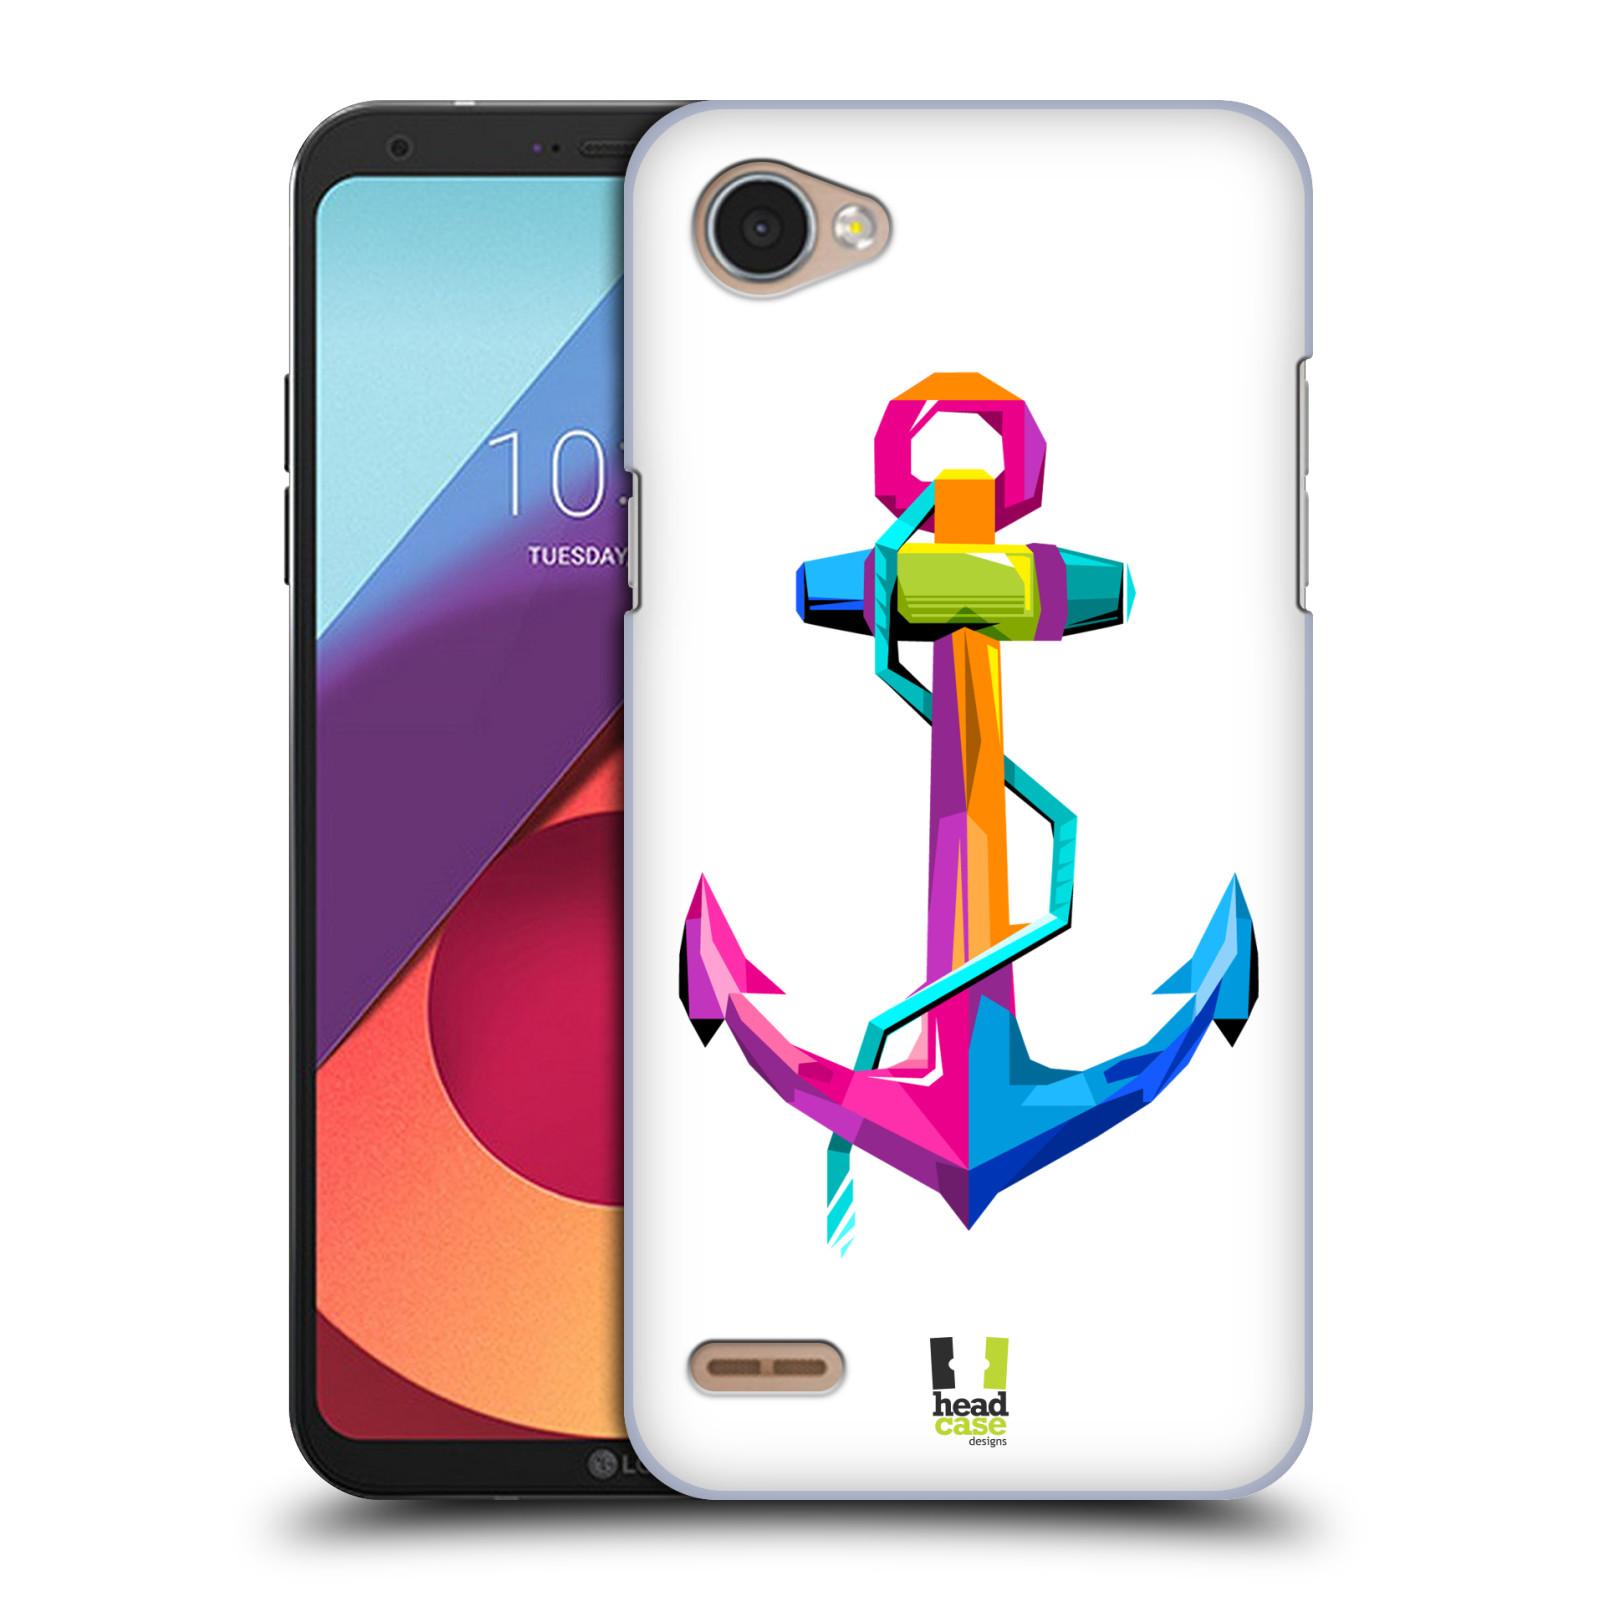 HEAD CASE plastový obal na mobil LG Q6 / Q6 PLUS vzor POP ART kubismus kotva naděje